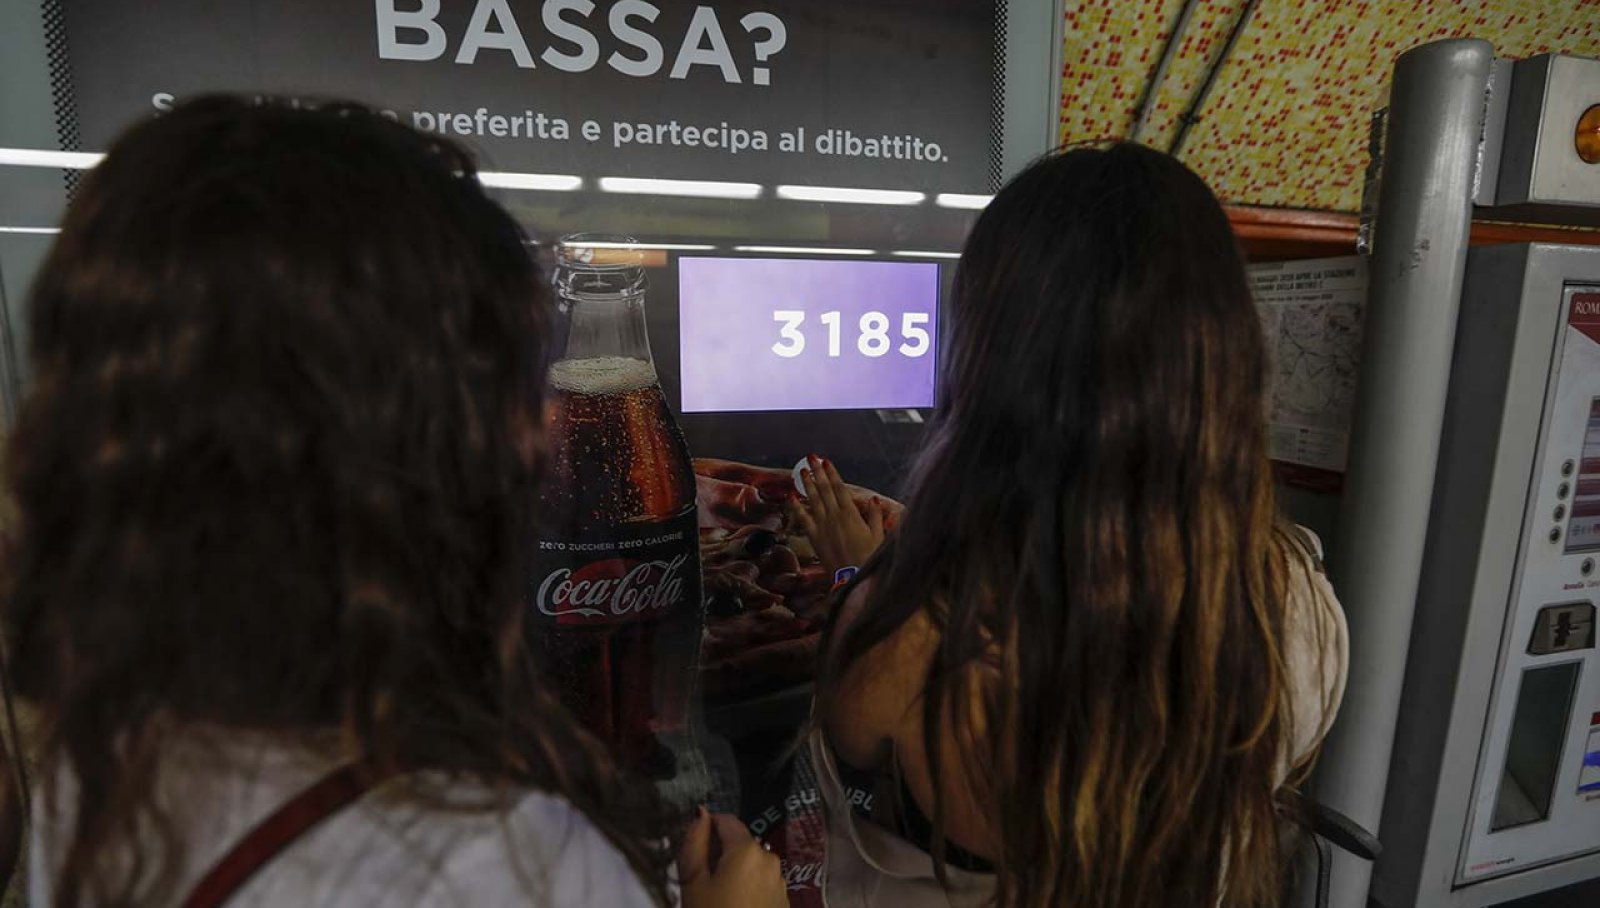 Coca-Cola DeGustibus station domination Roma